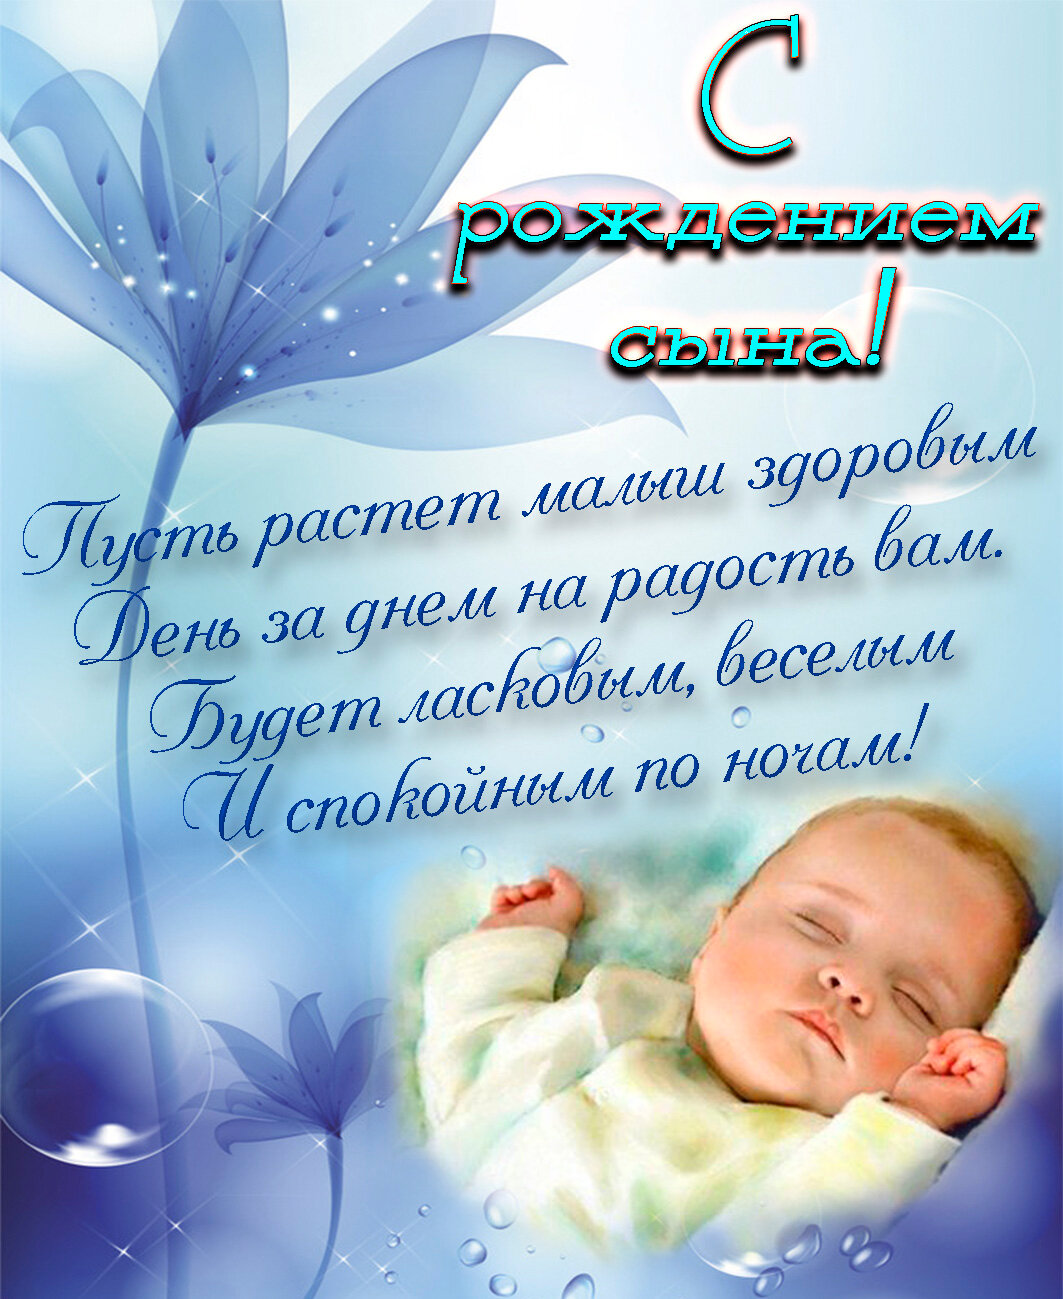 Открытки видео с рождением ребенка, картинки аленка рождество